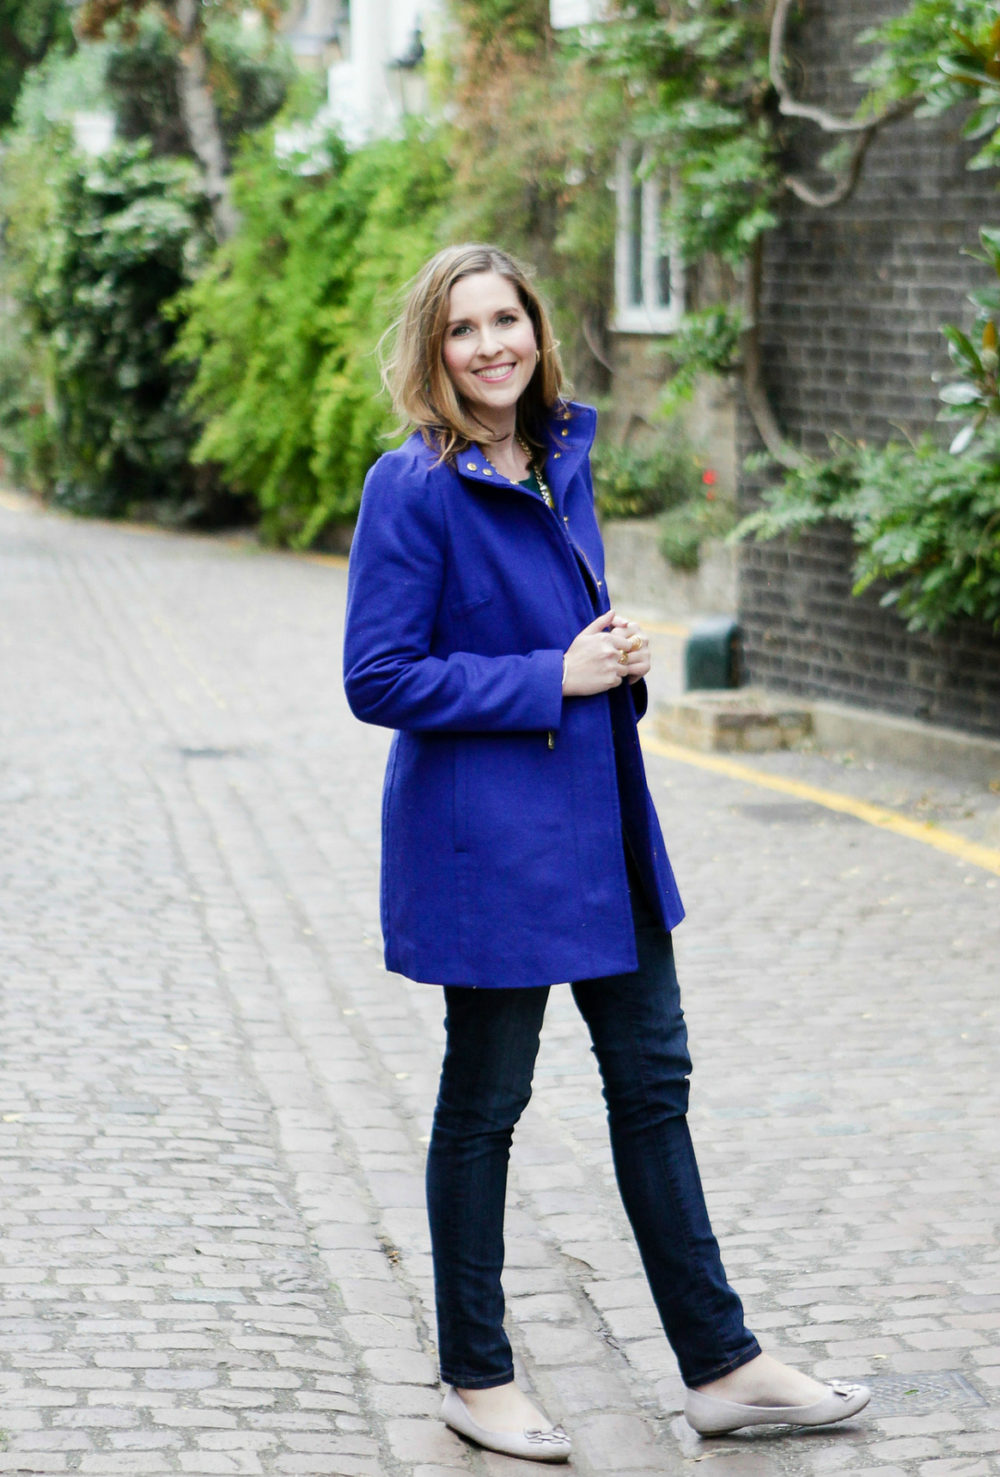 Girl standing in London mews in blue coat